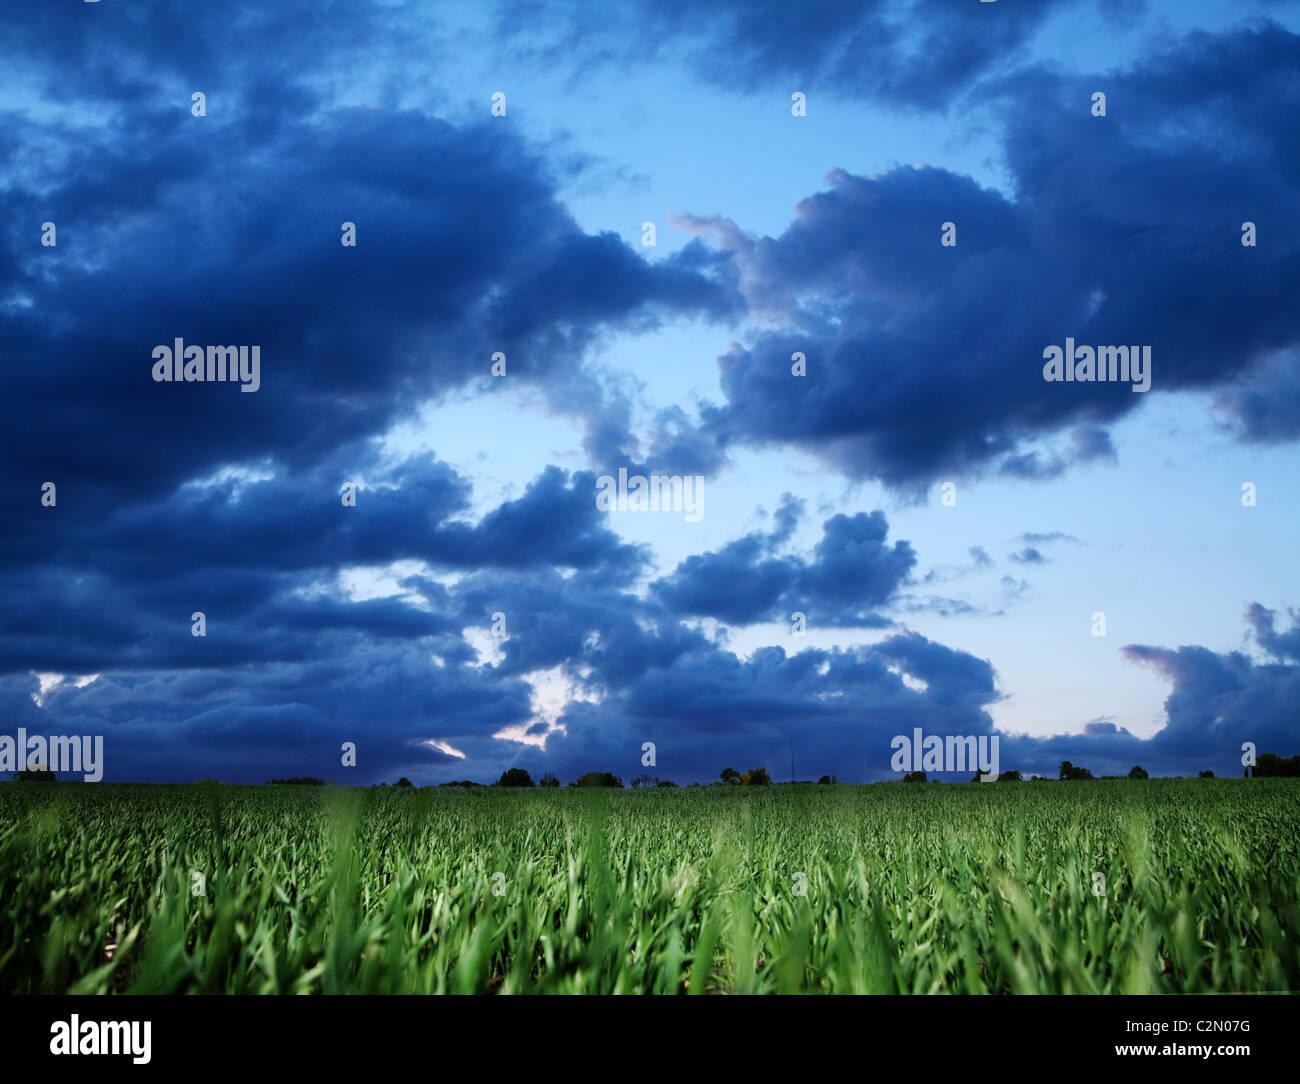 Campo de trigo y azul oscuro cielo tormentoso. Imagen De Stock